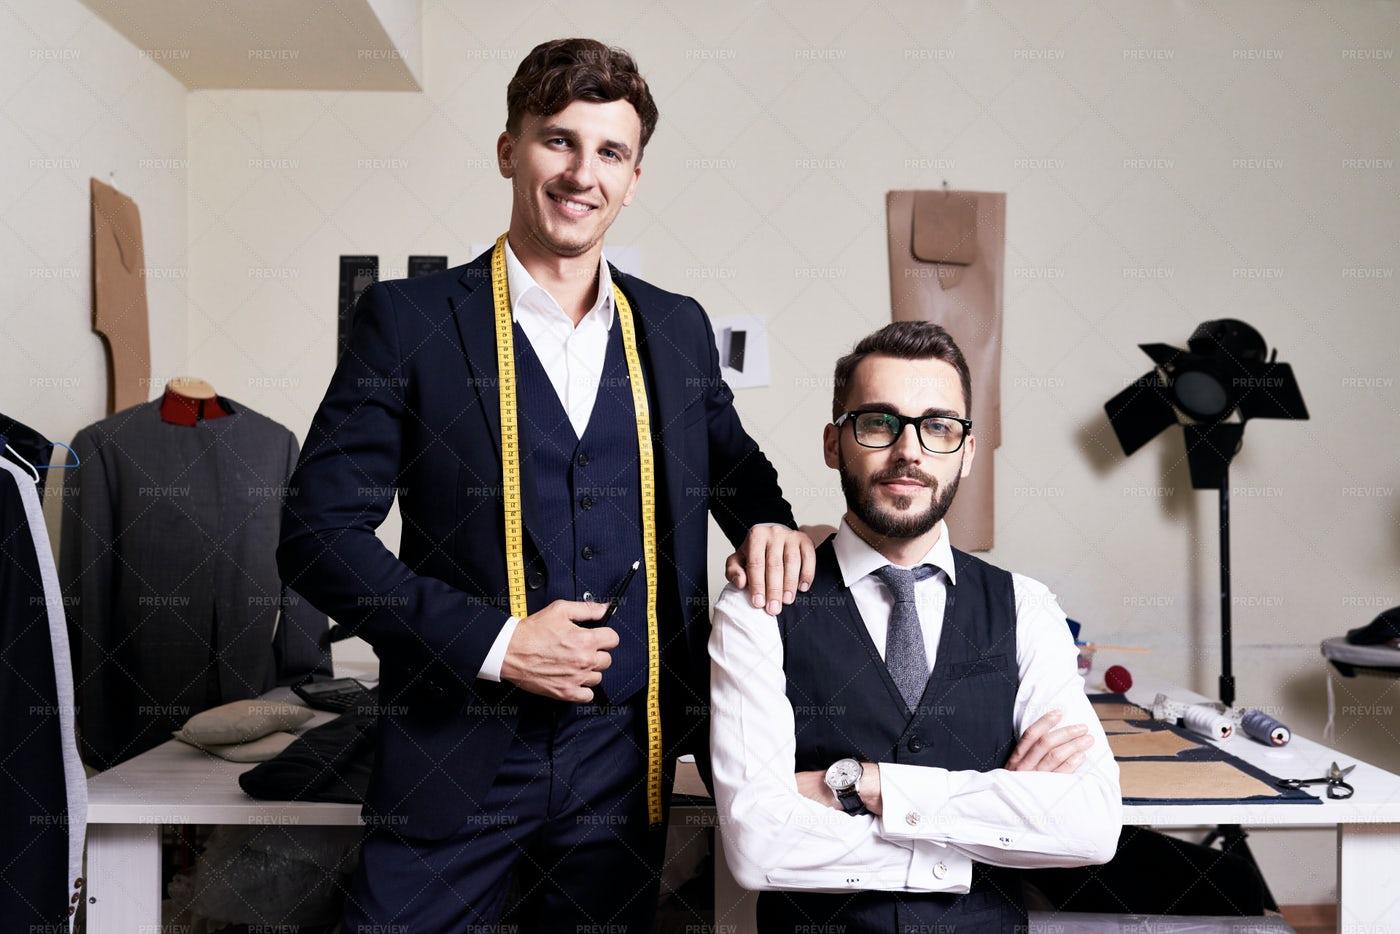 Modern Fashion Designers In Atelier: Stock Photos